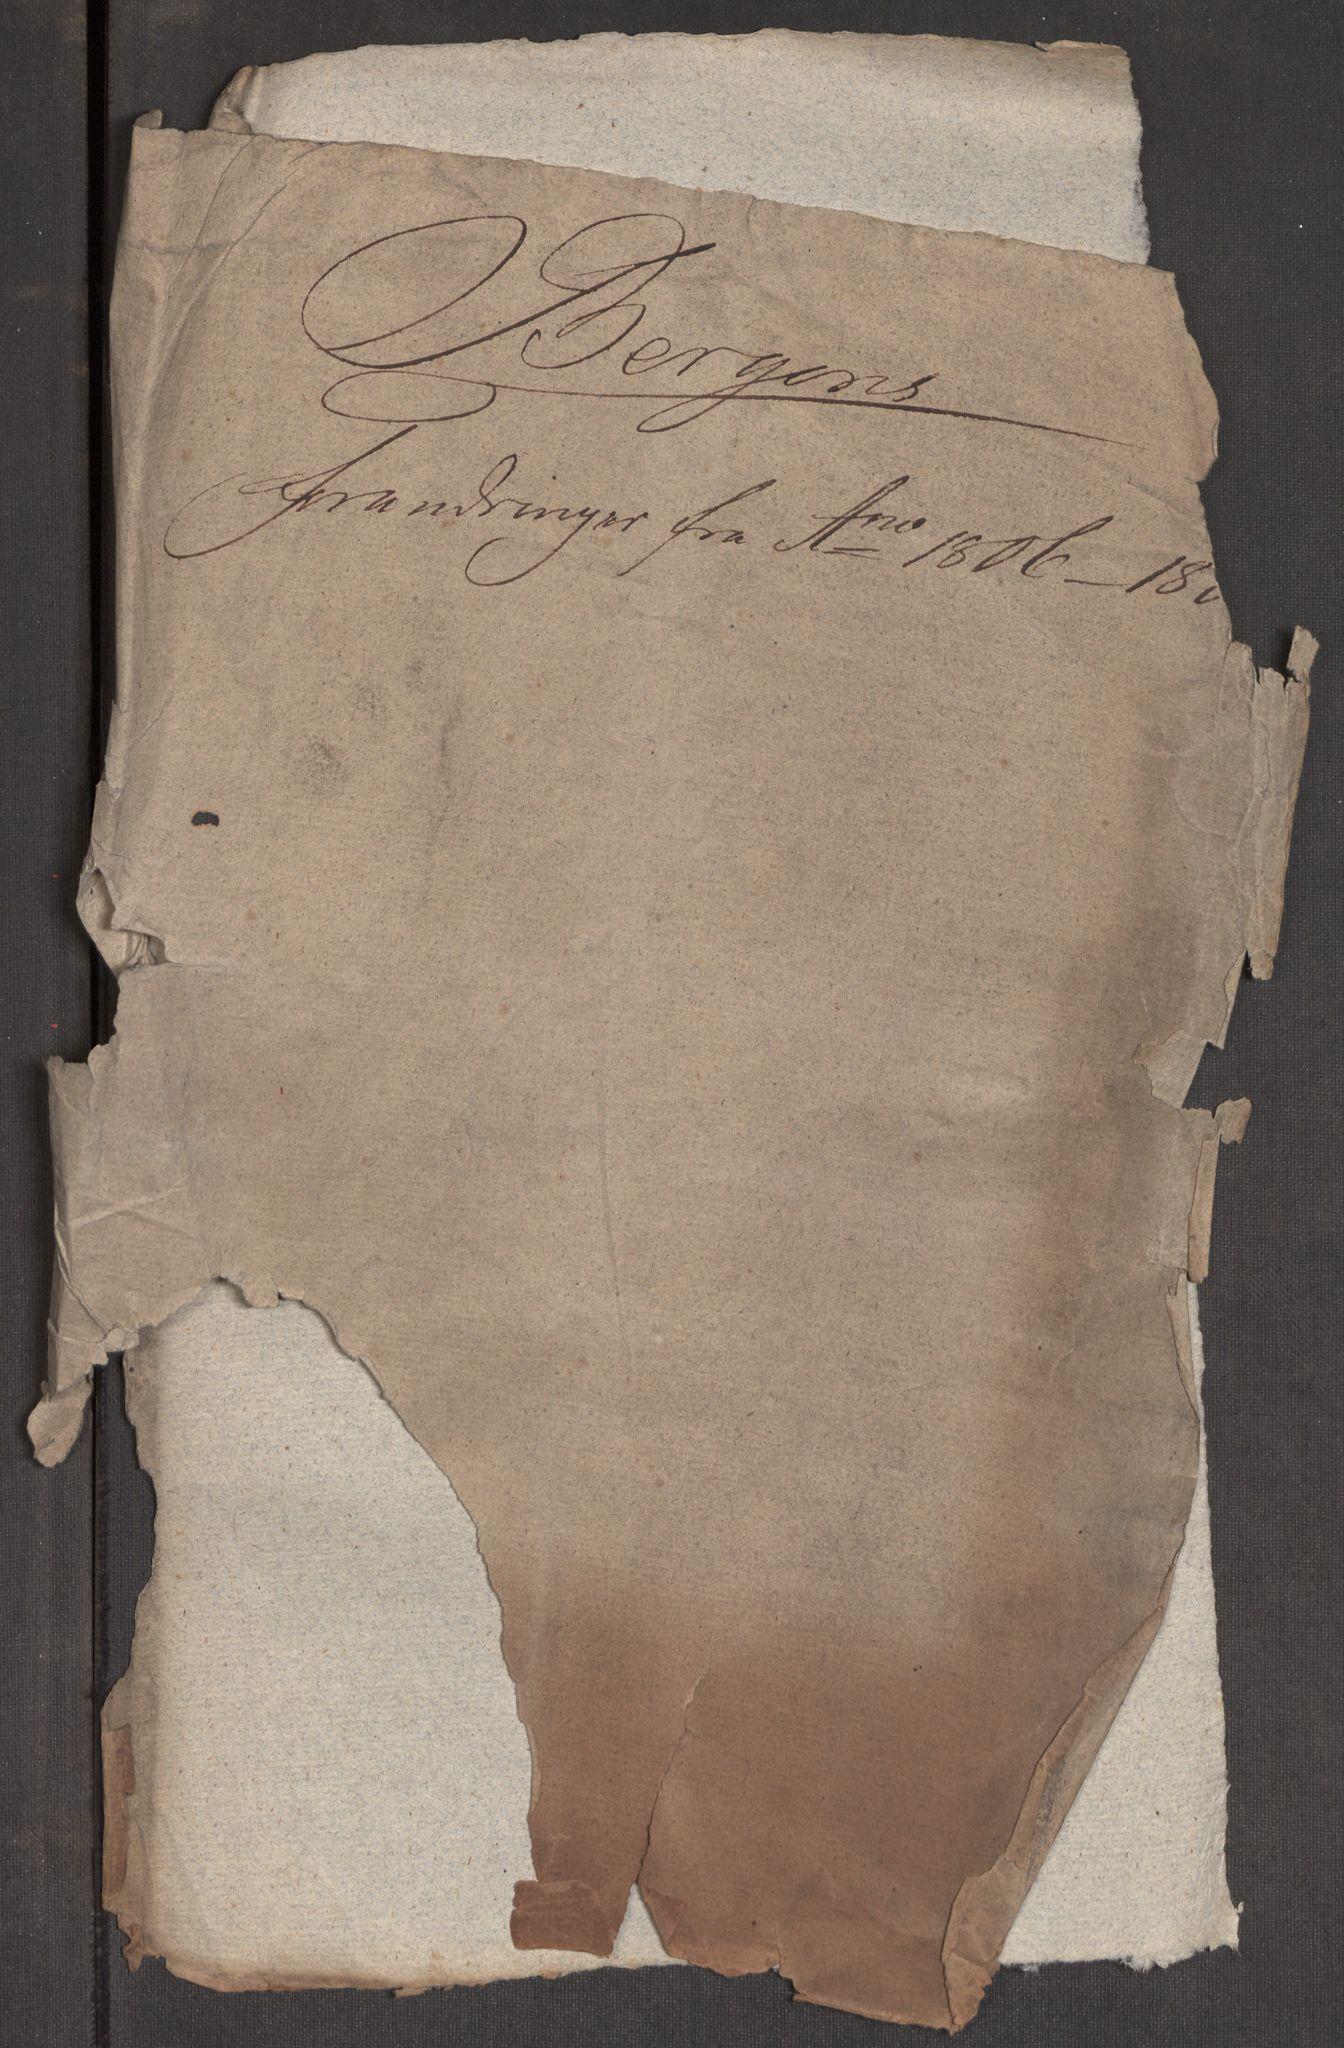 RA, Kommersekollegiet, Brannforsikringskontoret 1767-1814, F/Fa/L0006: Bergen, 1797-1807